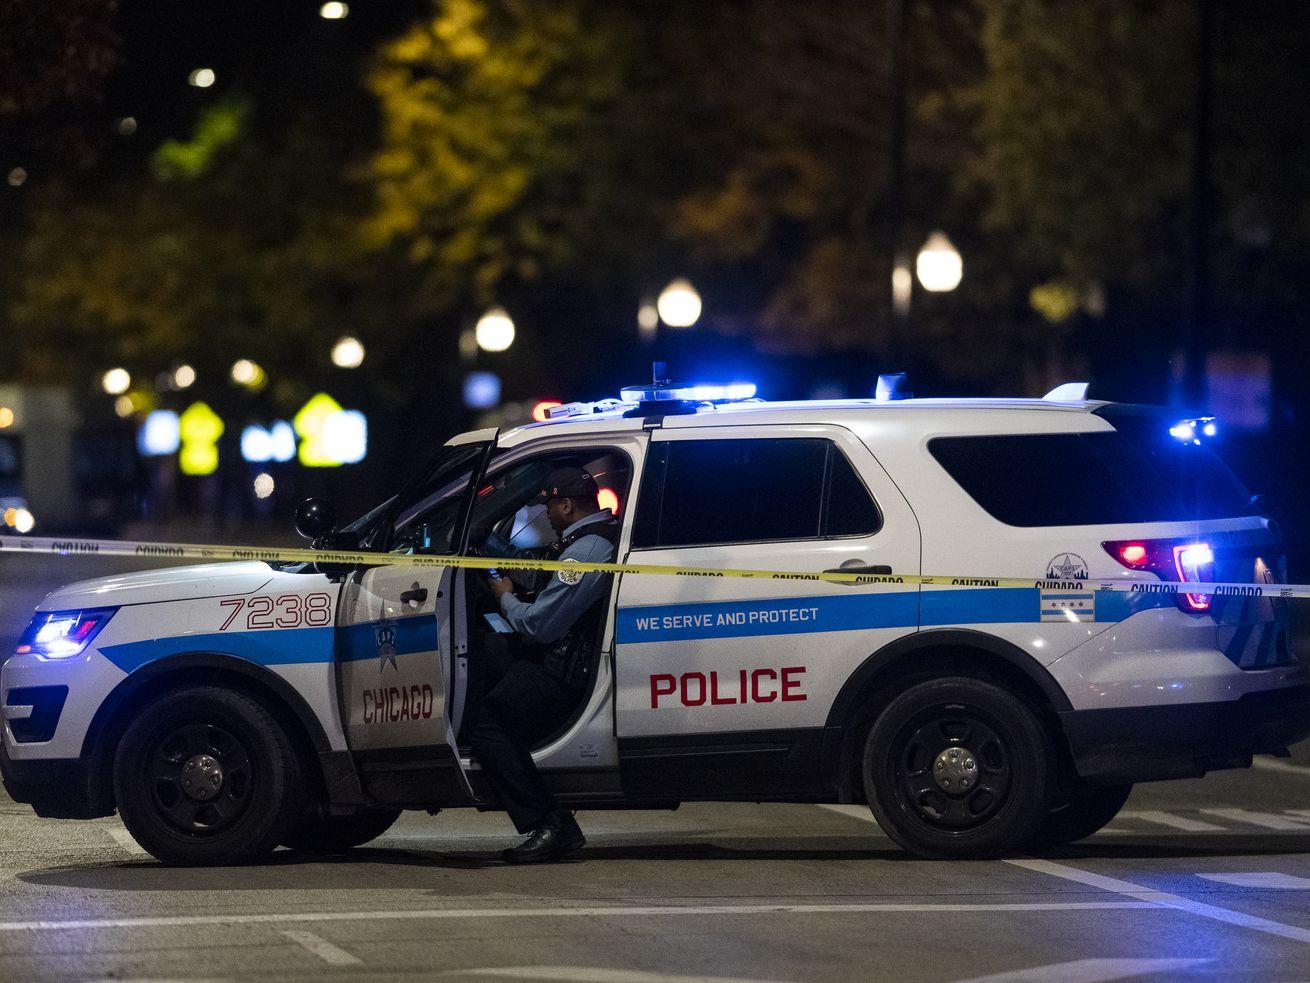 6 shot, 1 fatally, Wednesday in Chicago